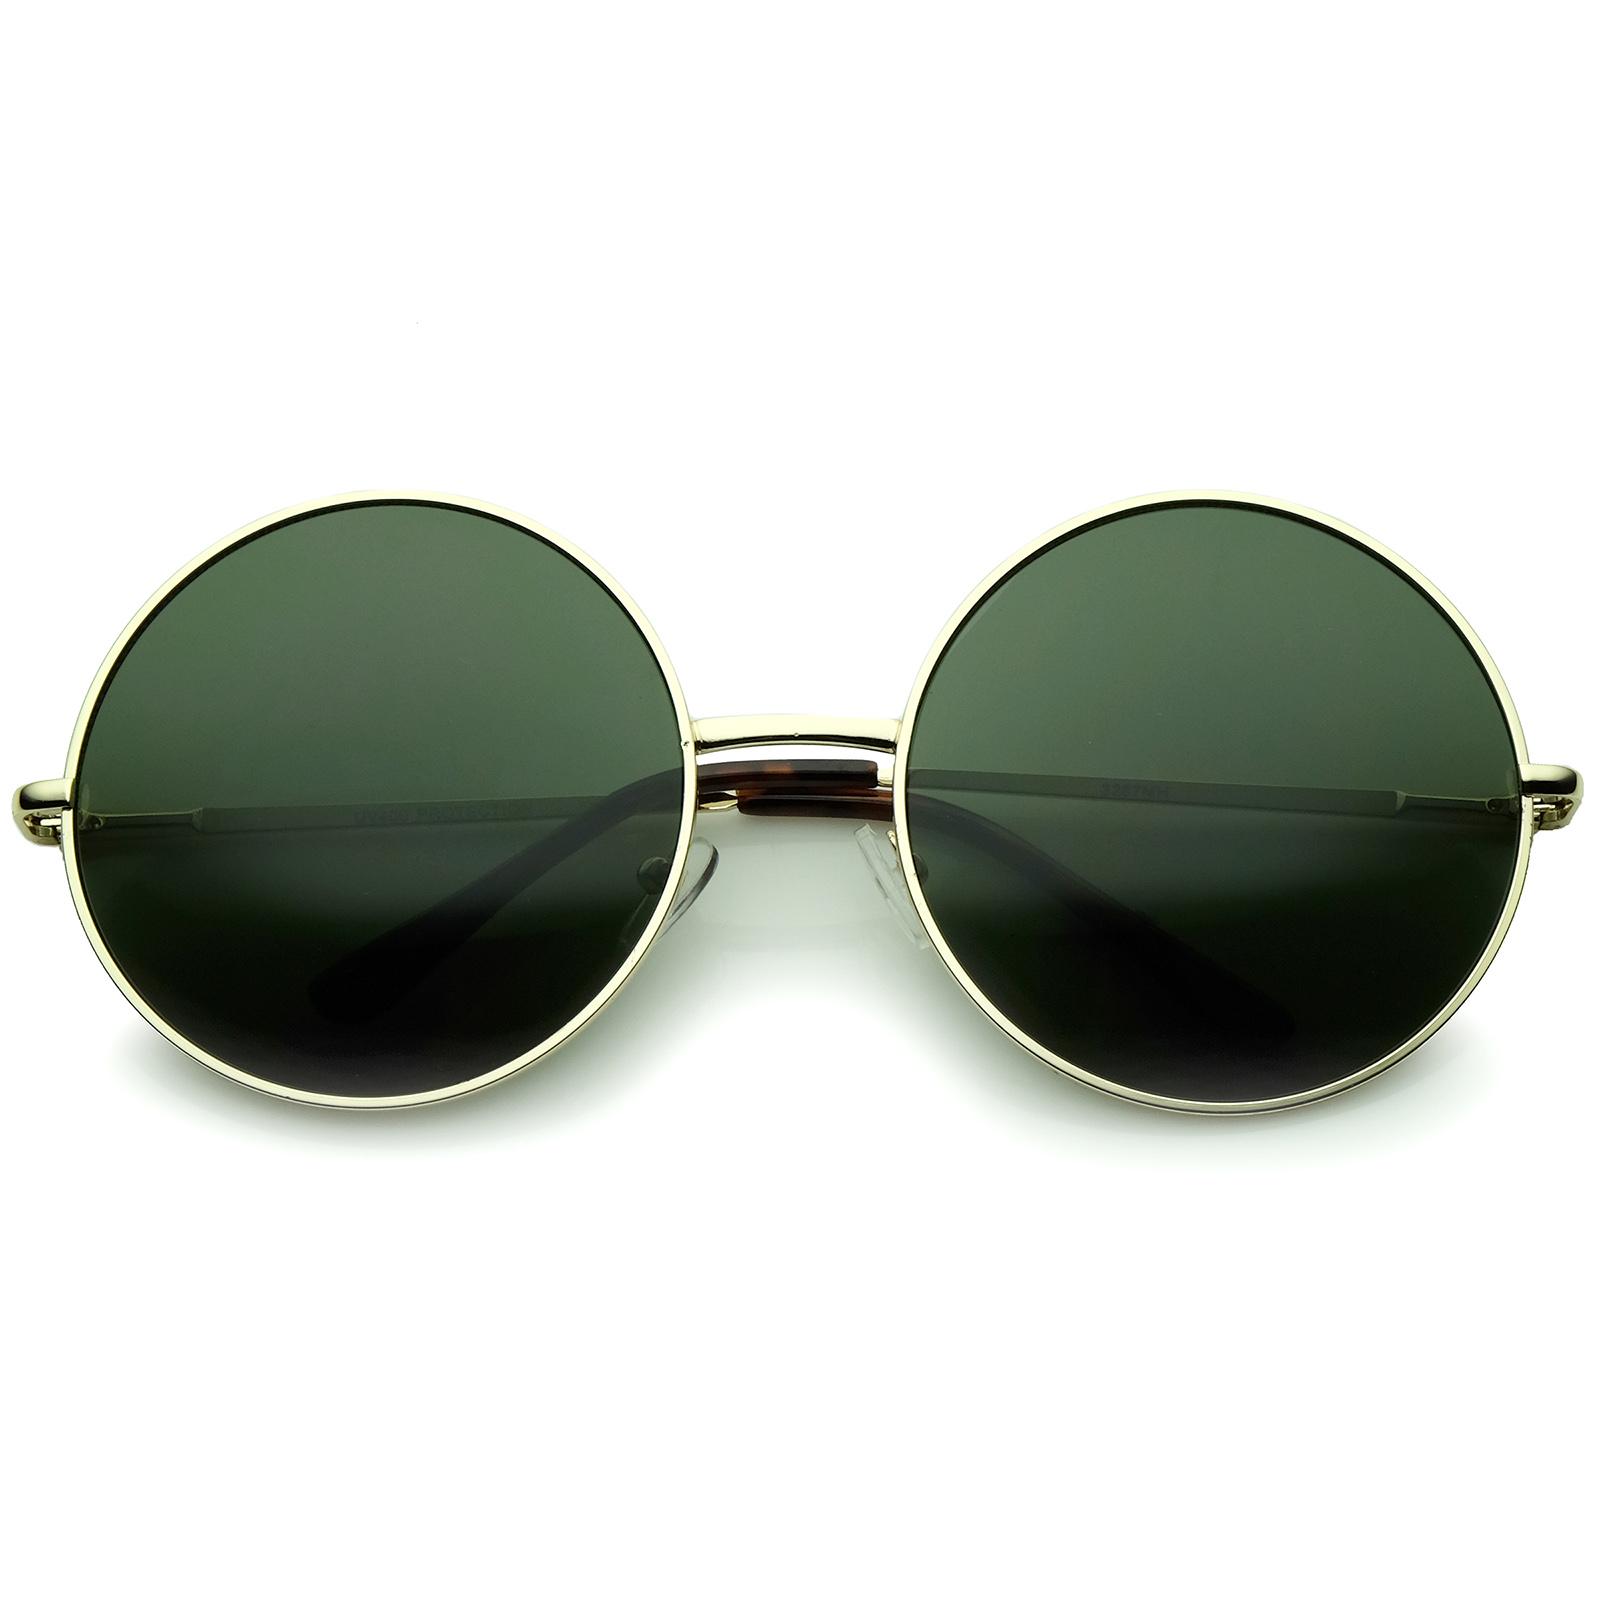 sunglassLA-Super-Large-Oversize-Slim-Temple-Round-Sunglasses